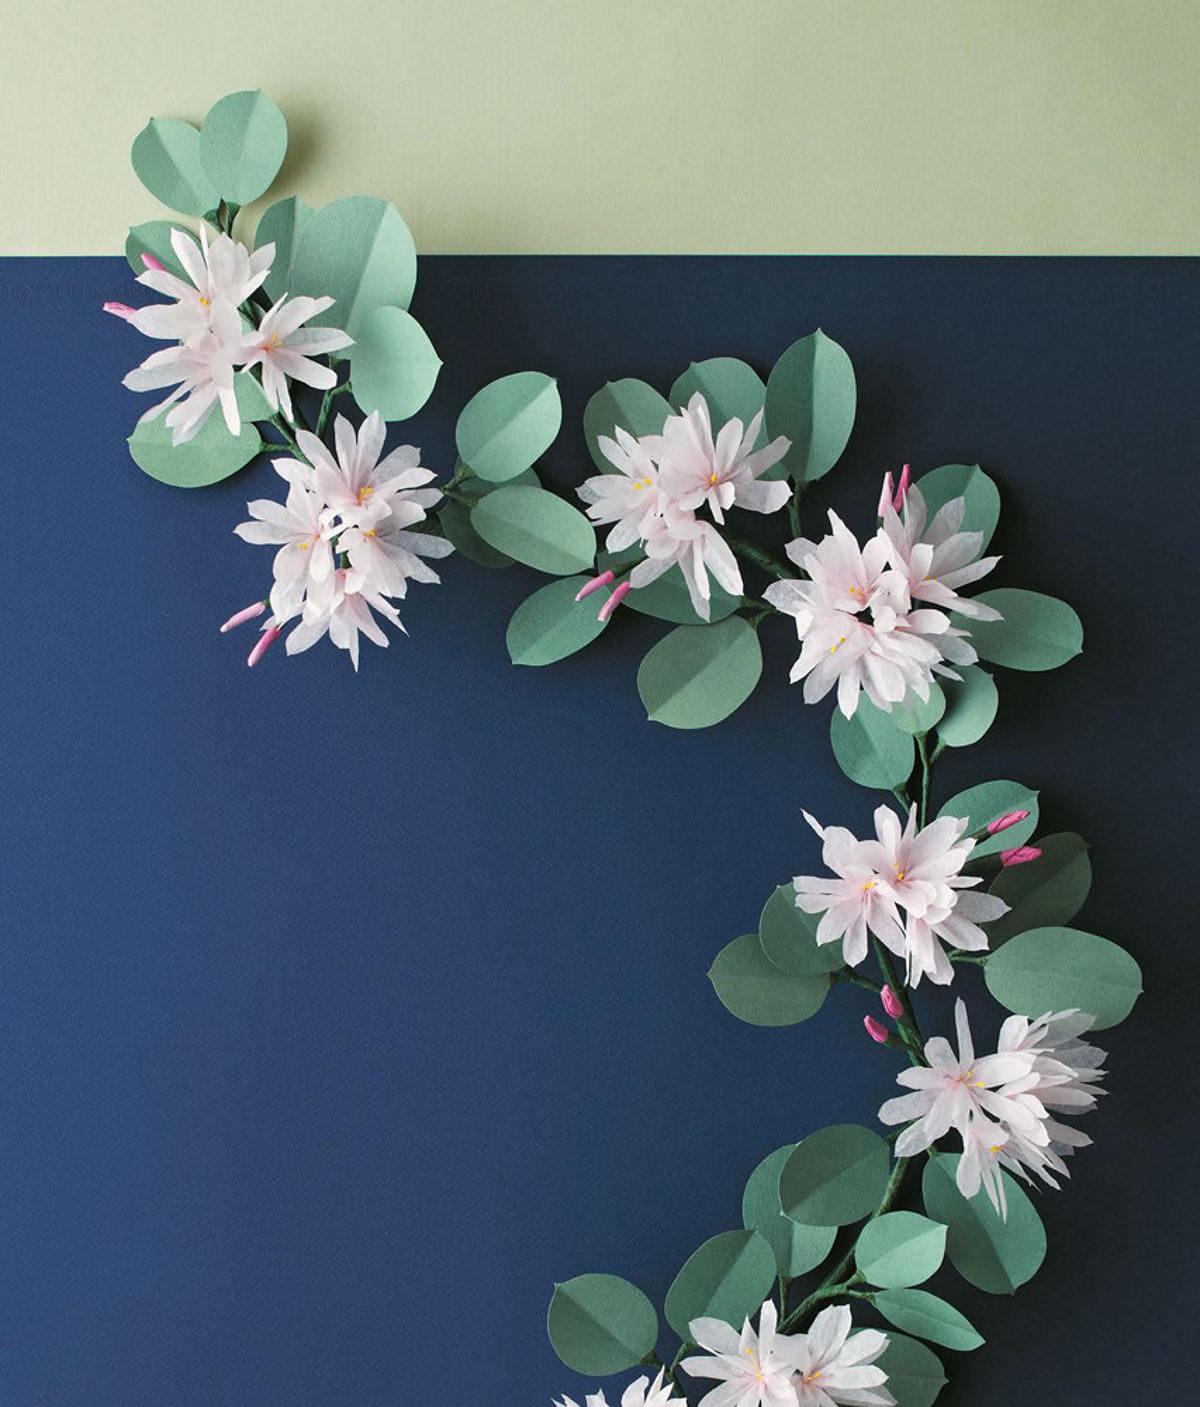 MLDI311 jasmin fleurs papier DIY